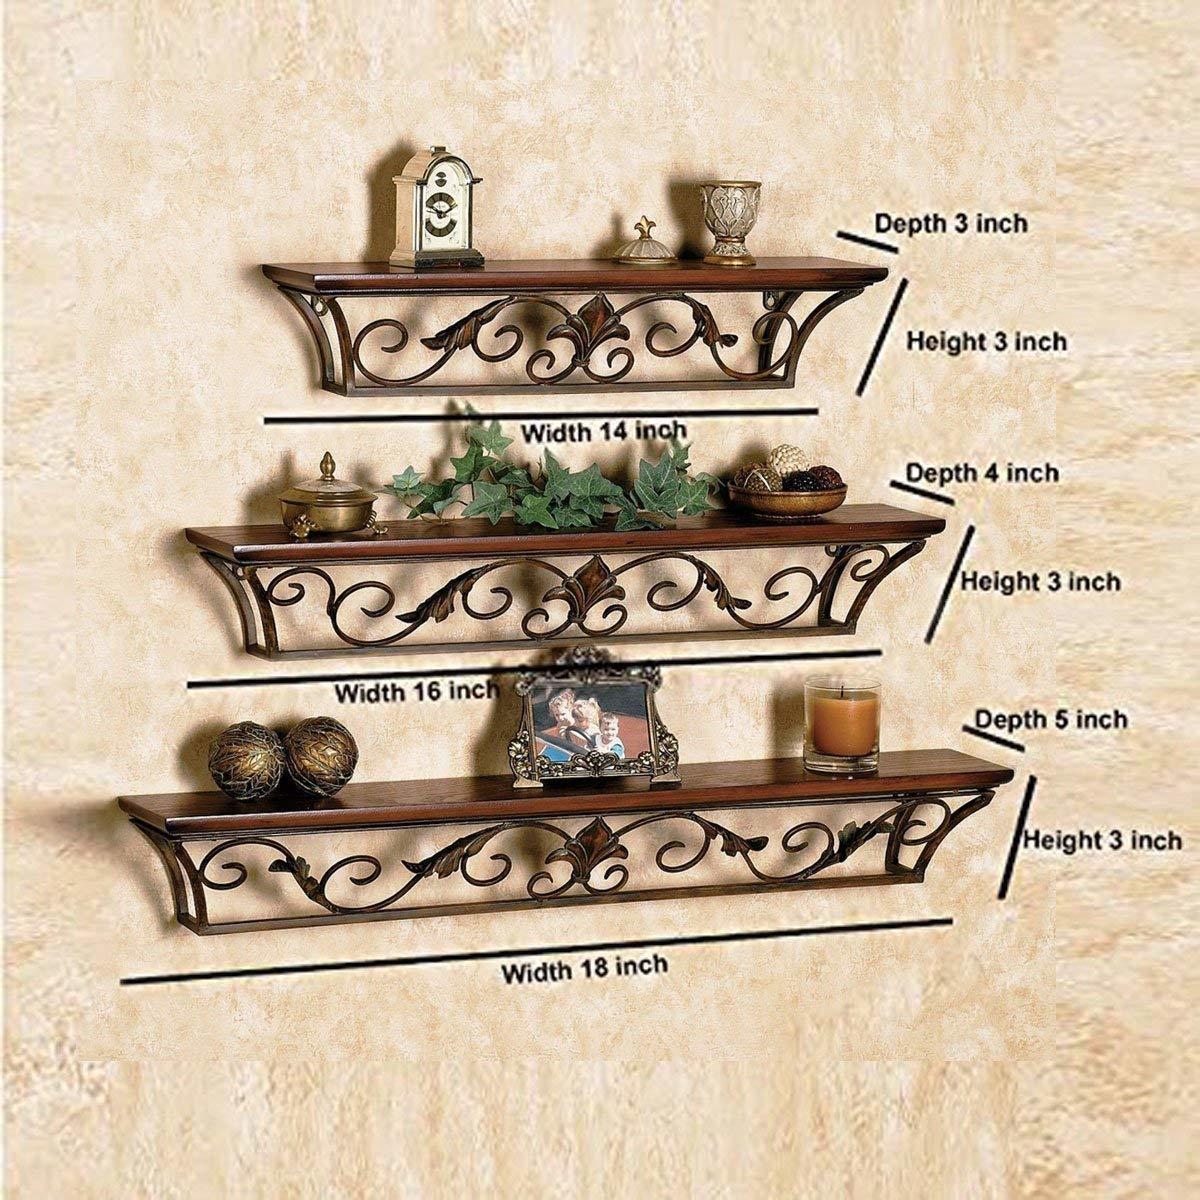 Wooden Iron Wall Shelf Wall Bracket Floating Wall Shelves Set of 3